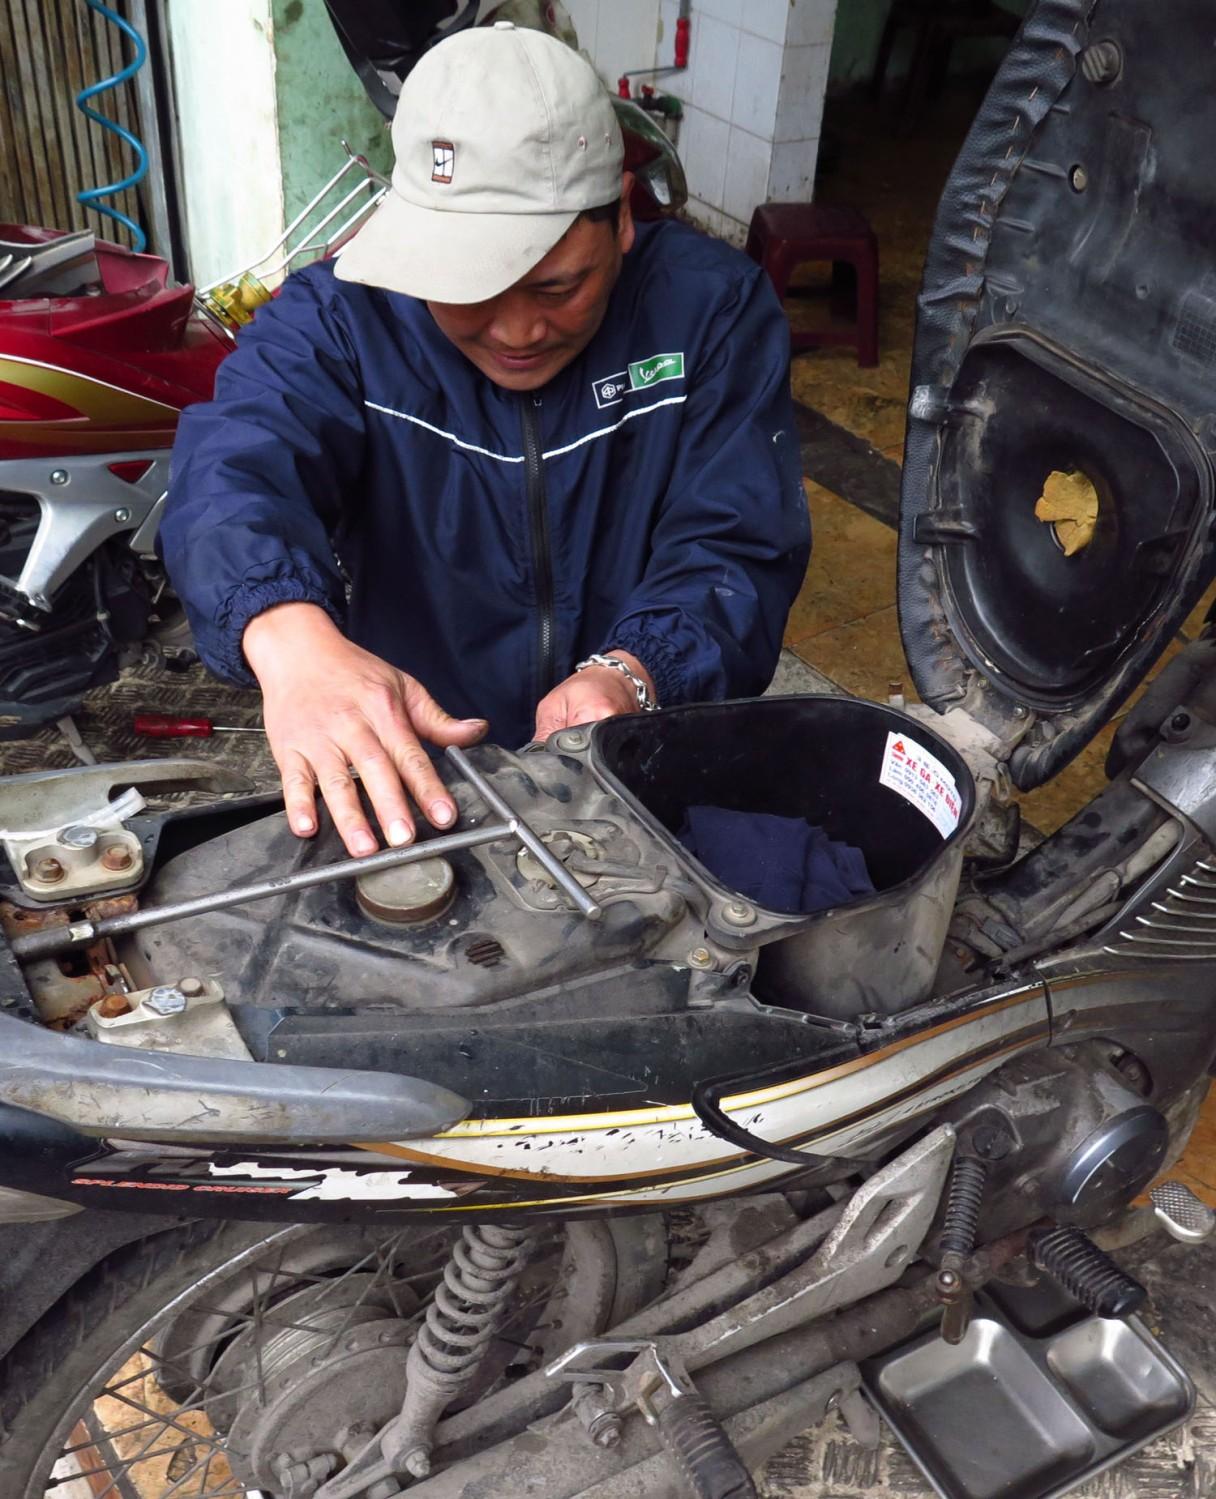 Vietnam-Hanoi-Street-Scenes-Motorbike-Repair